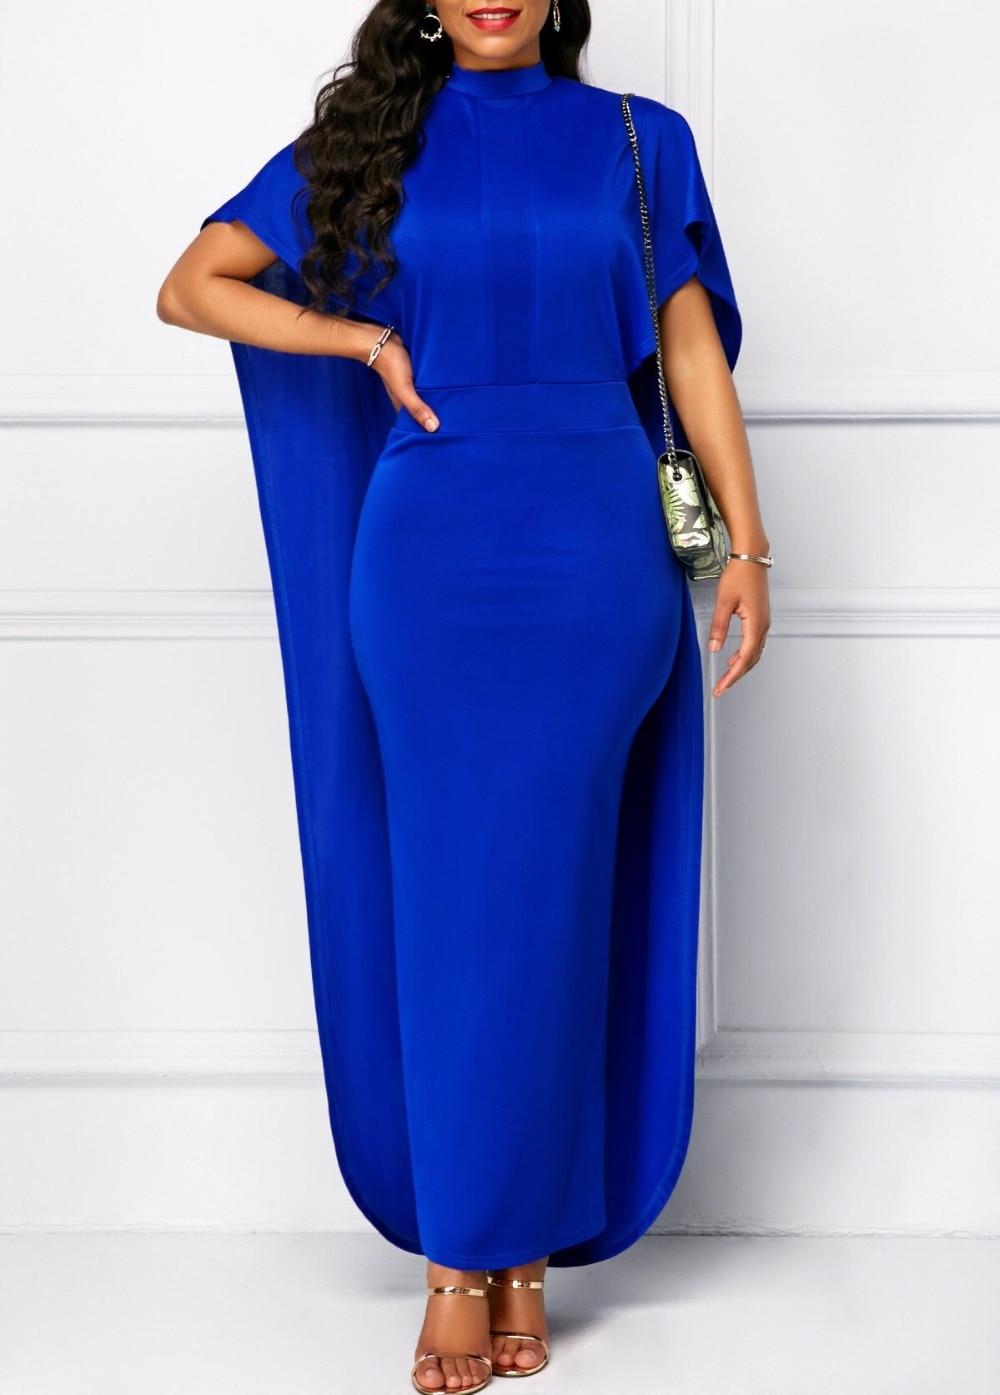 High Neck Short Sleeves   Prom     Dresses   Long Evening   Dress   2019